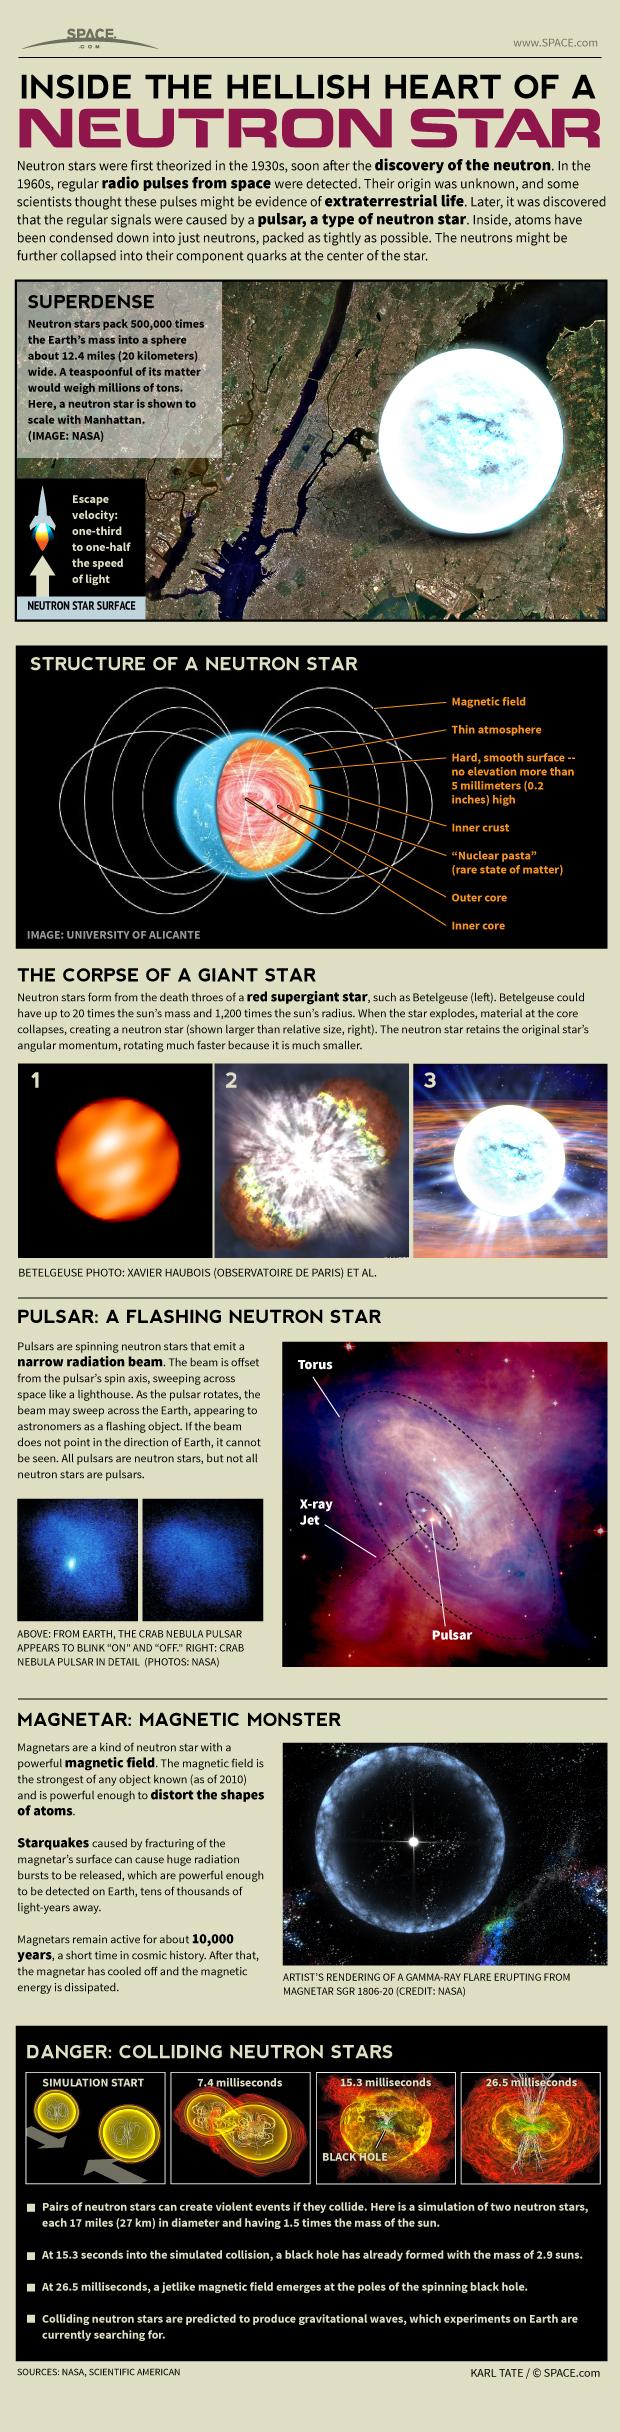 Infographic: How neutron stars, pulsars and magnetars work.